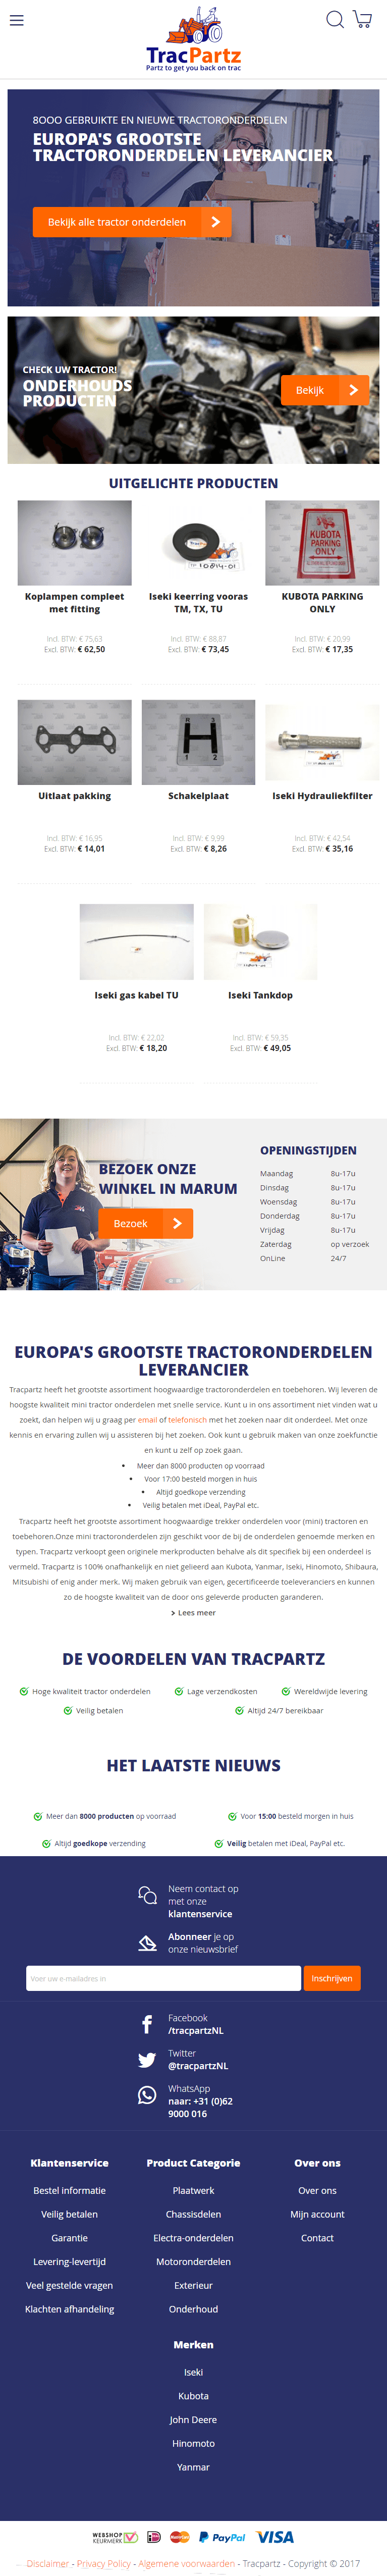 TracPartz